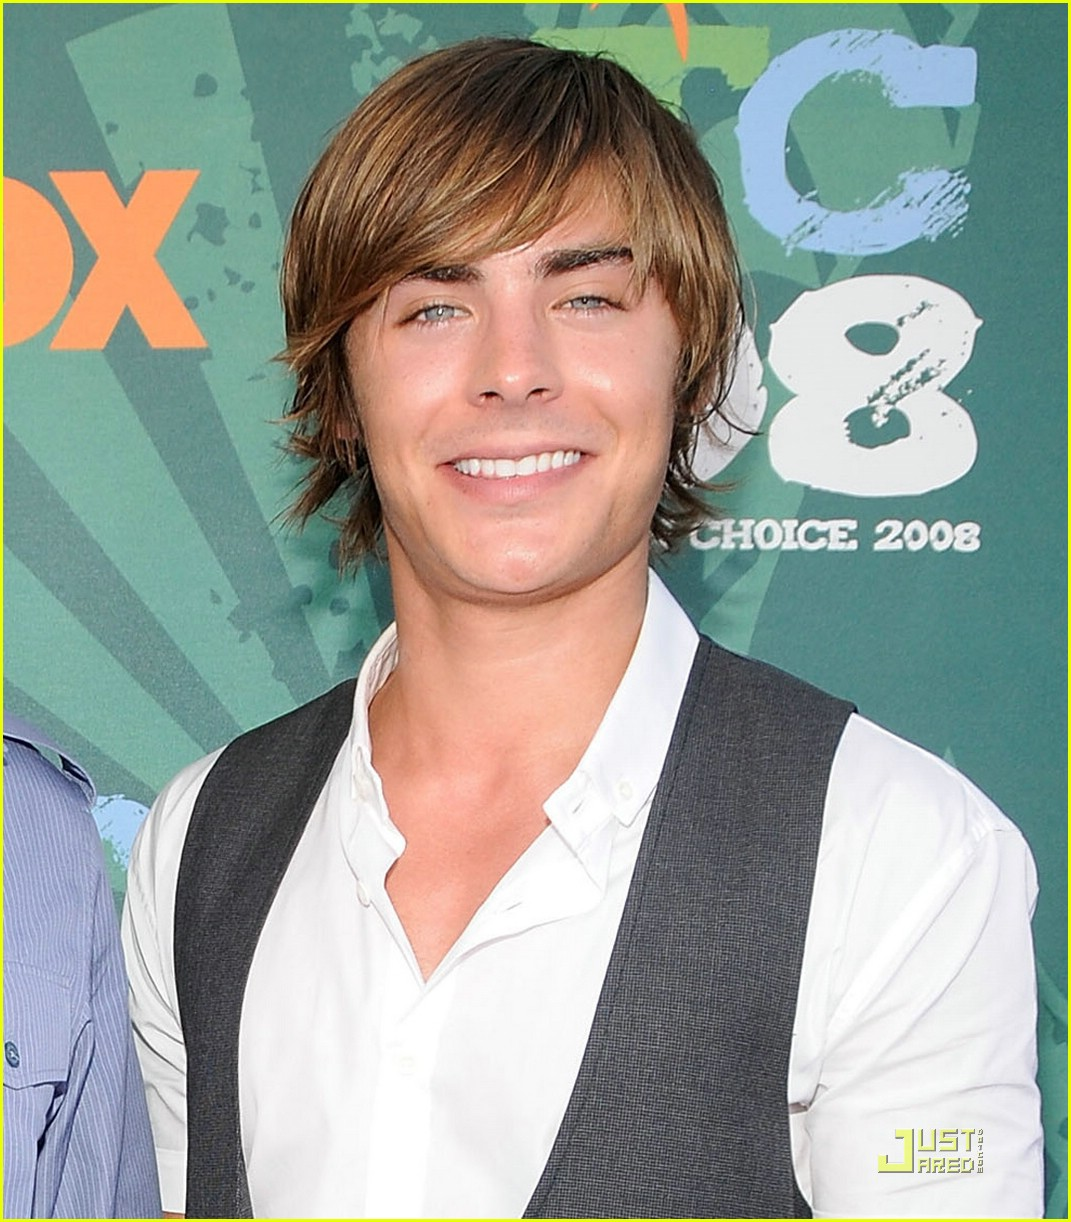 Zac Efron - Teen Choice Awards  Zac Efron 2008